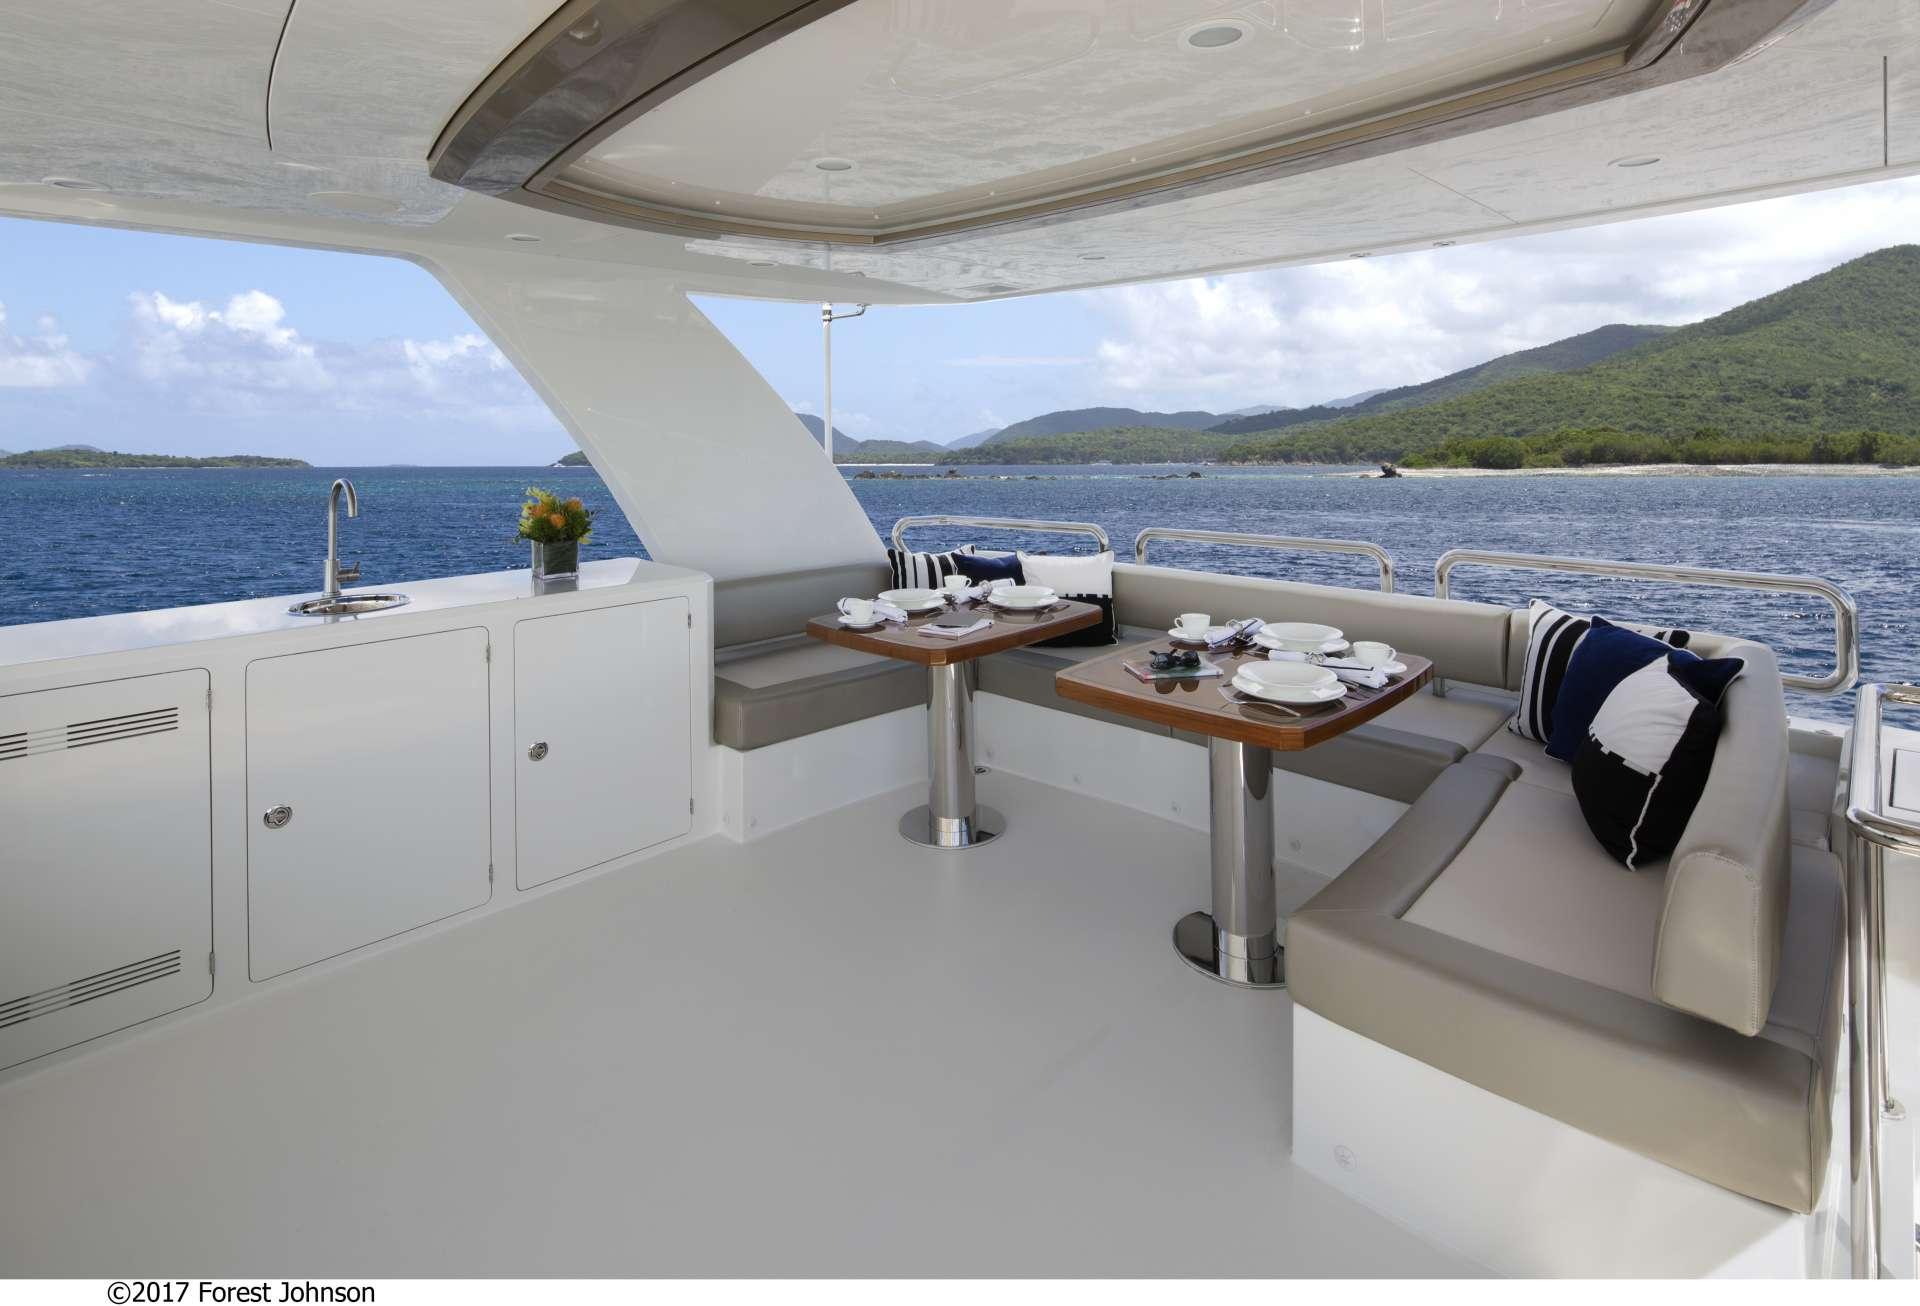 SUGARAY yacht image # 5